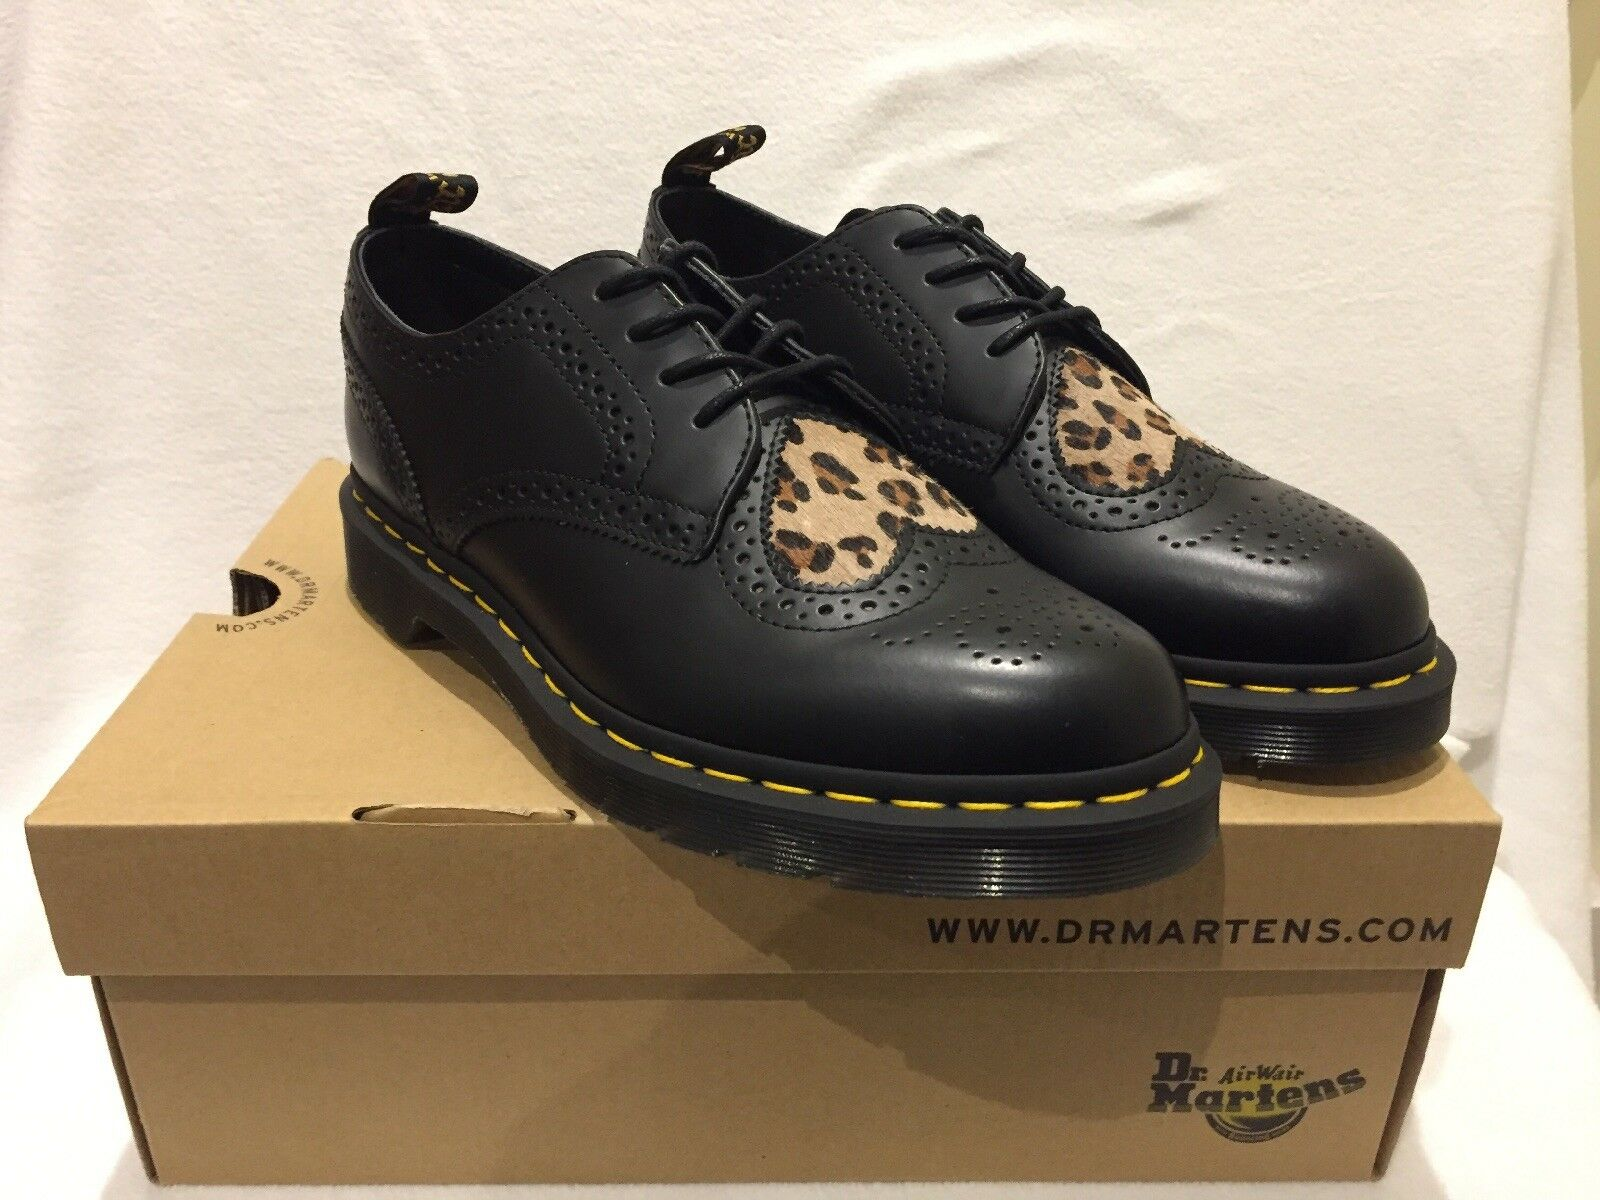 Dr Martens Joyce Joyce Joyce Heart Black Leather shoes Size 9 Uk 02dff2